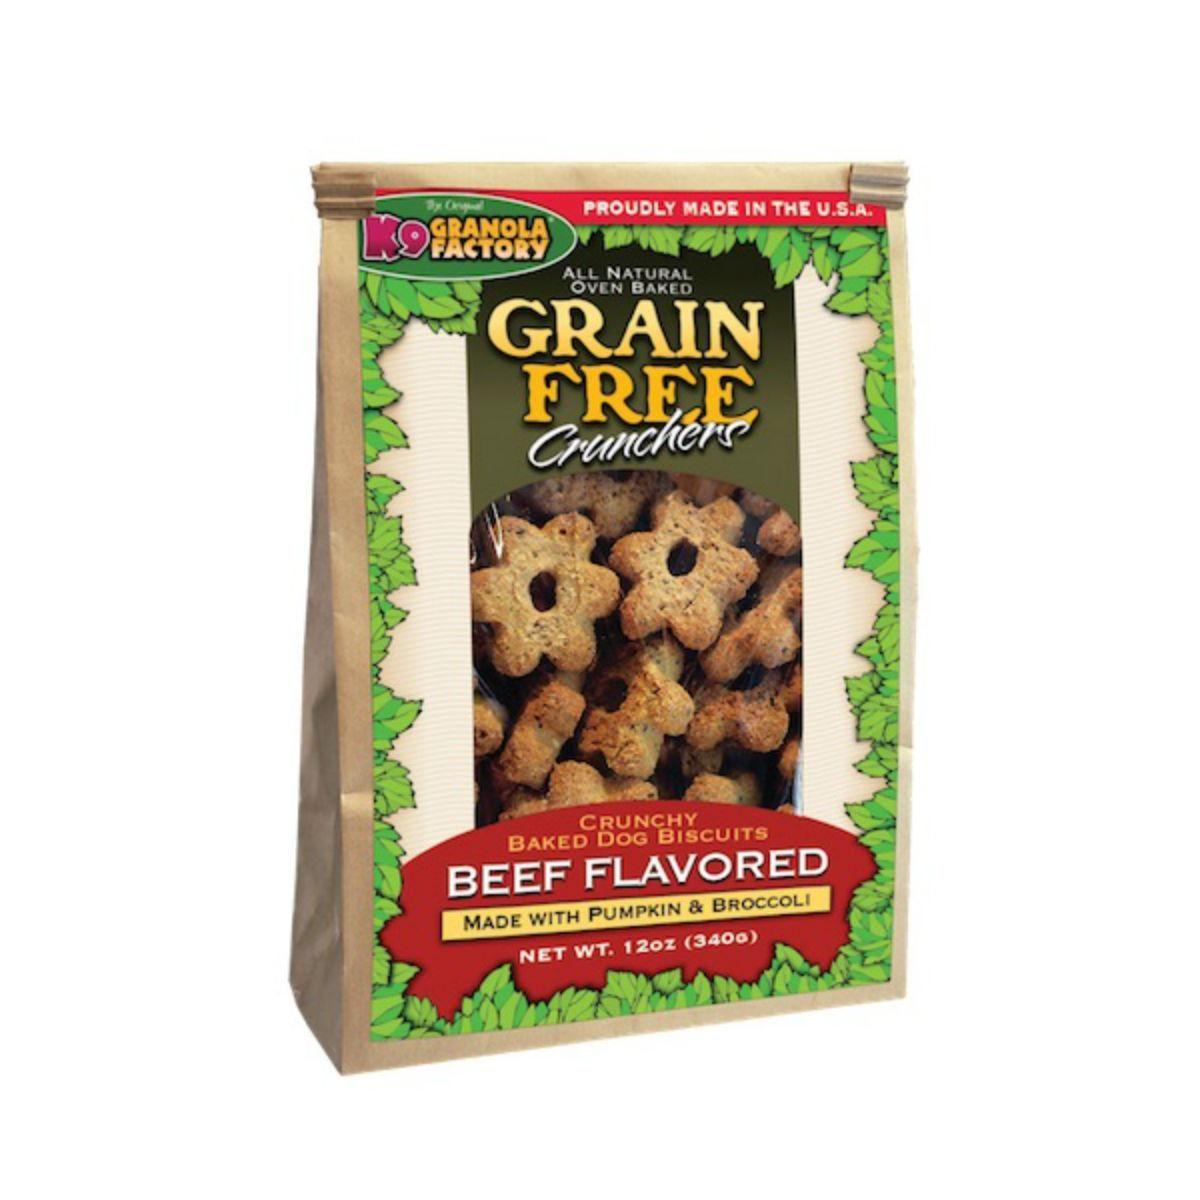 Grain free crunchers dog treat dried beef with pumpkin